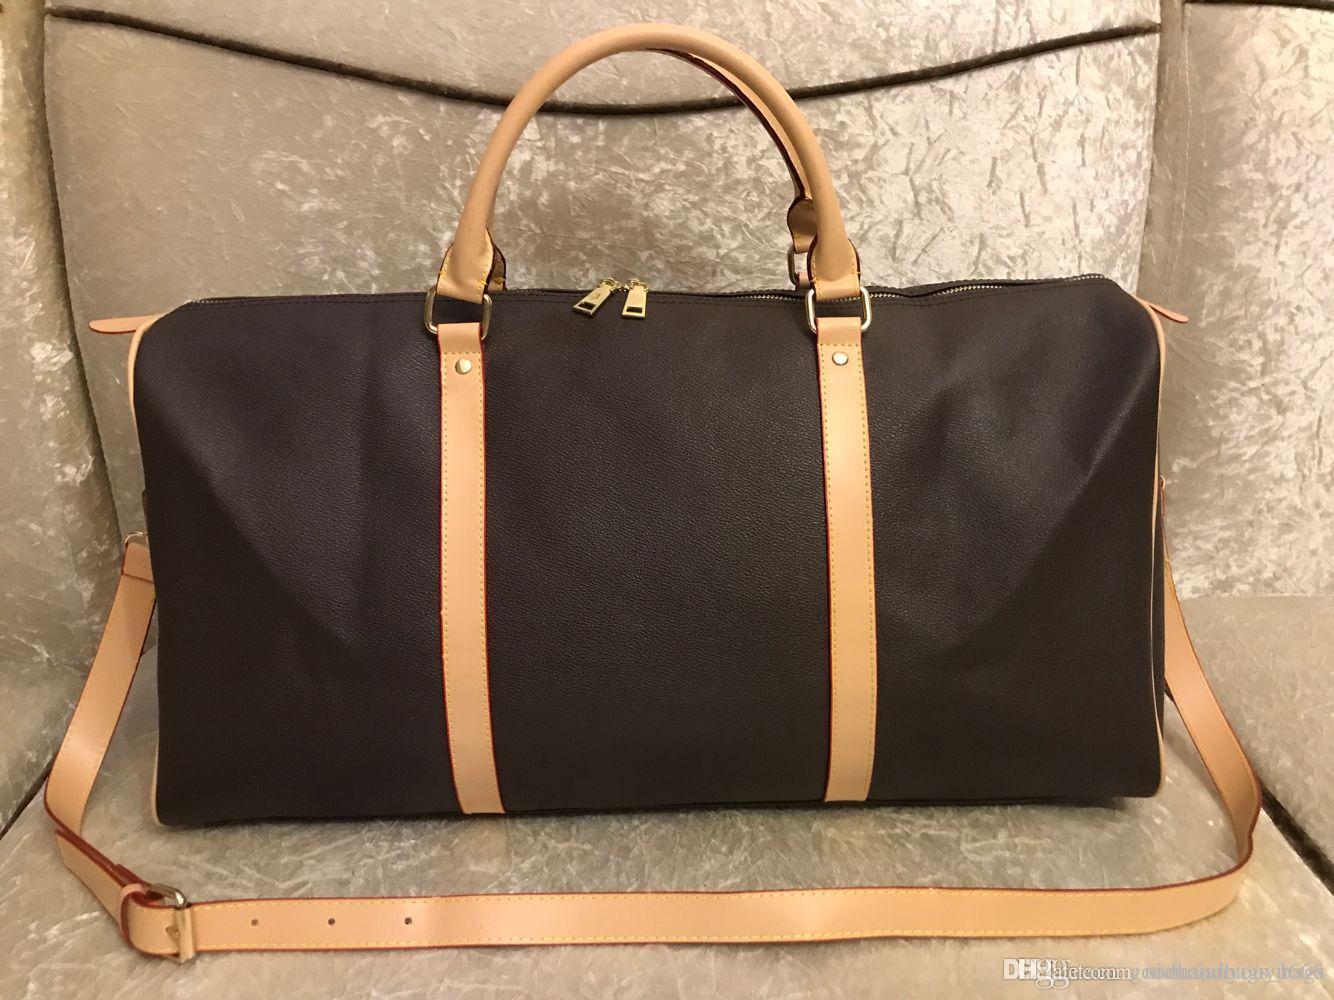 2014NEW top fashion men women travel bag duffle bag, brand luggage handbags large capacity sport bag SIZE 62CM #51885